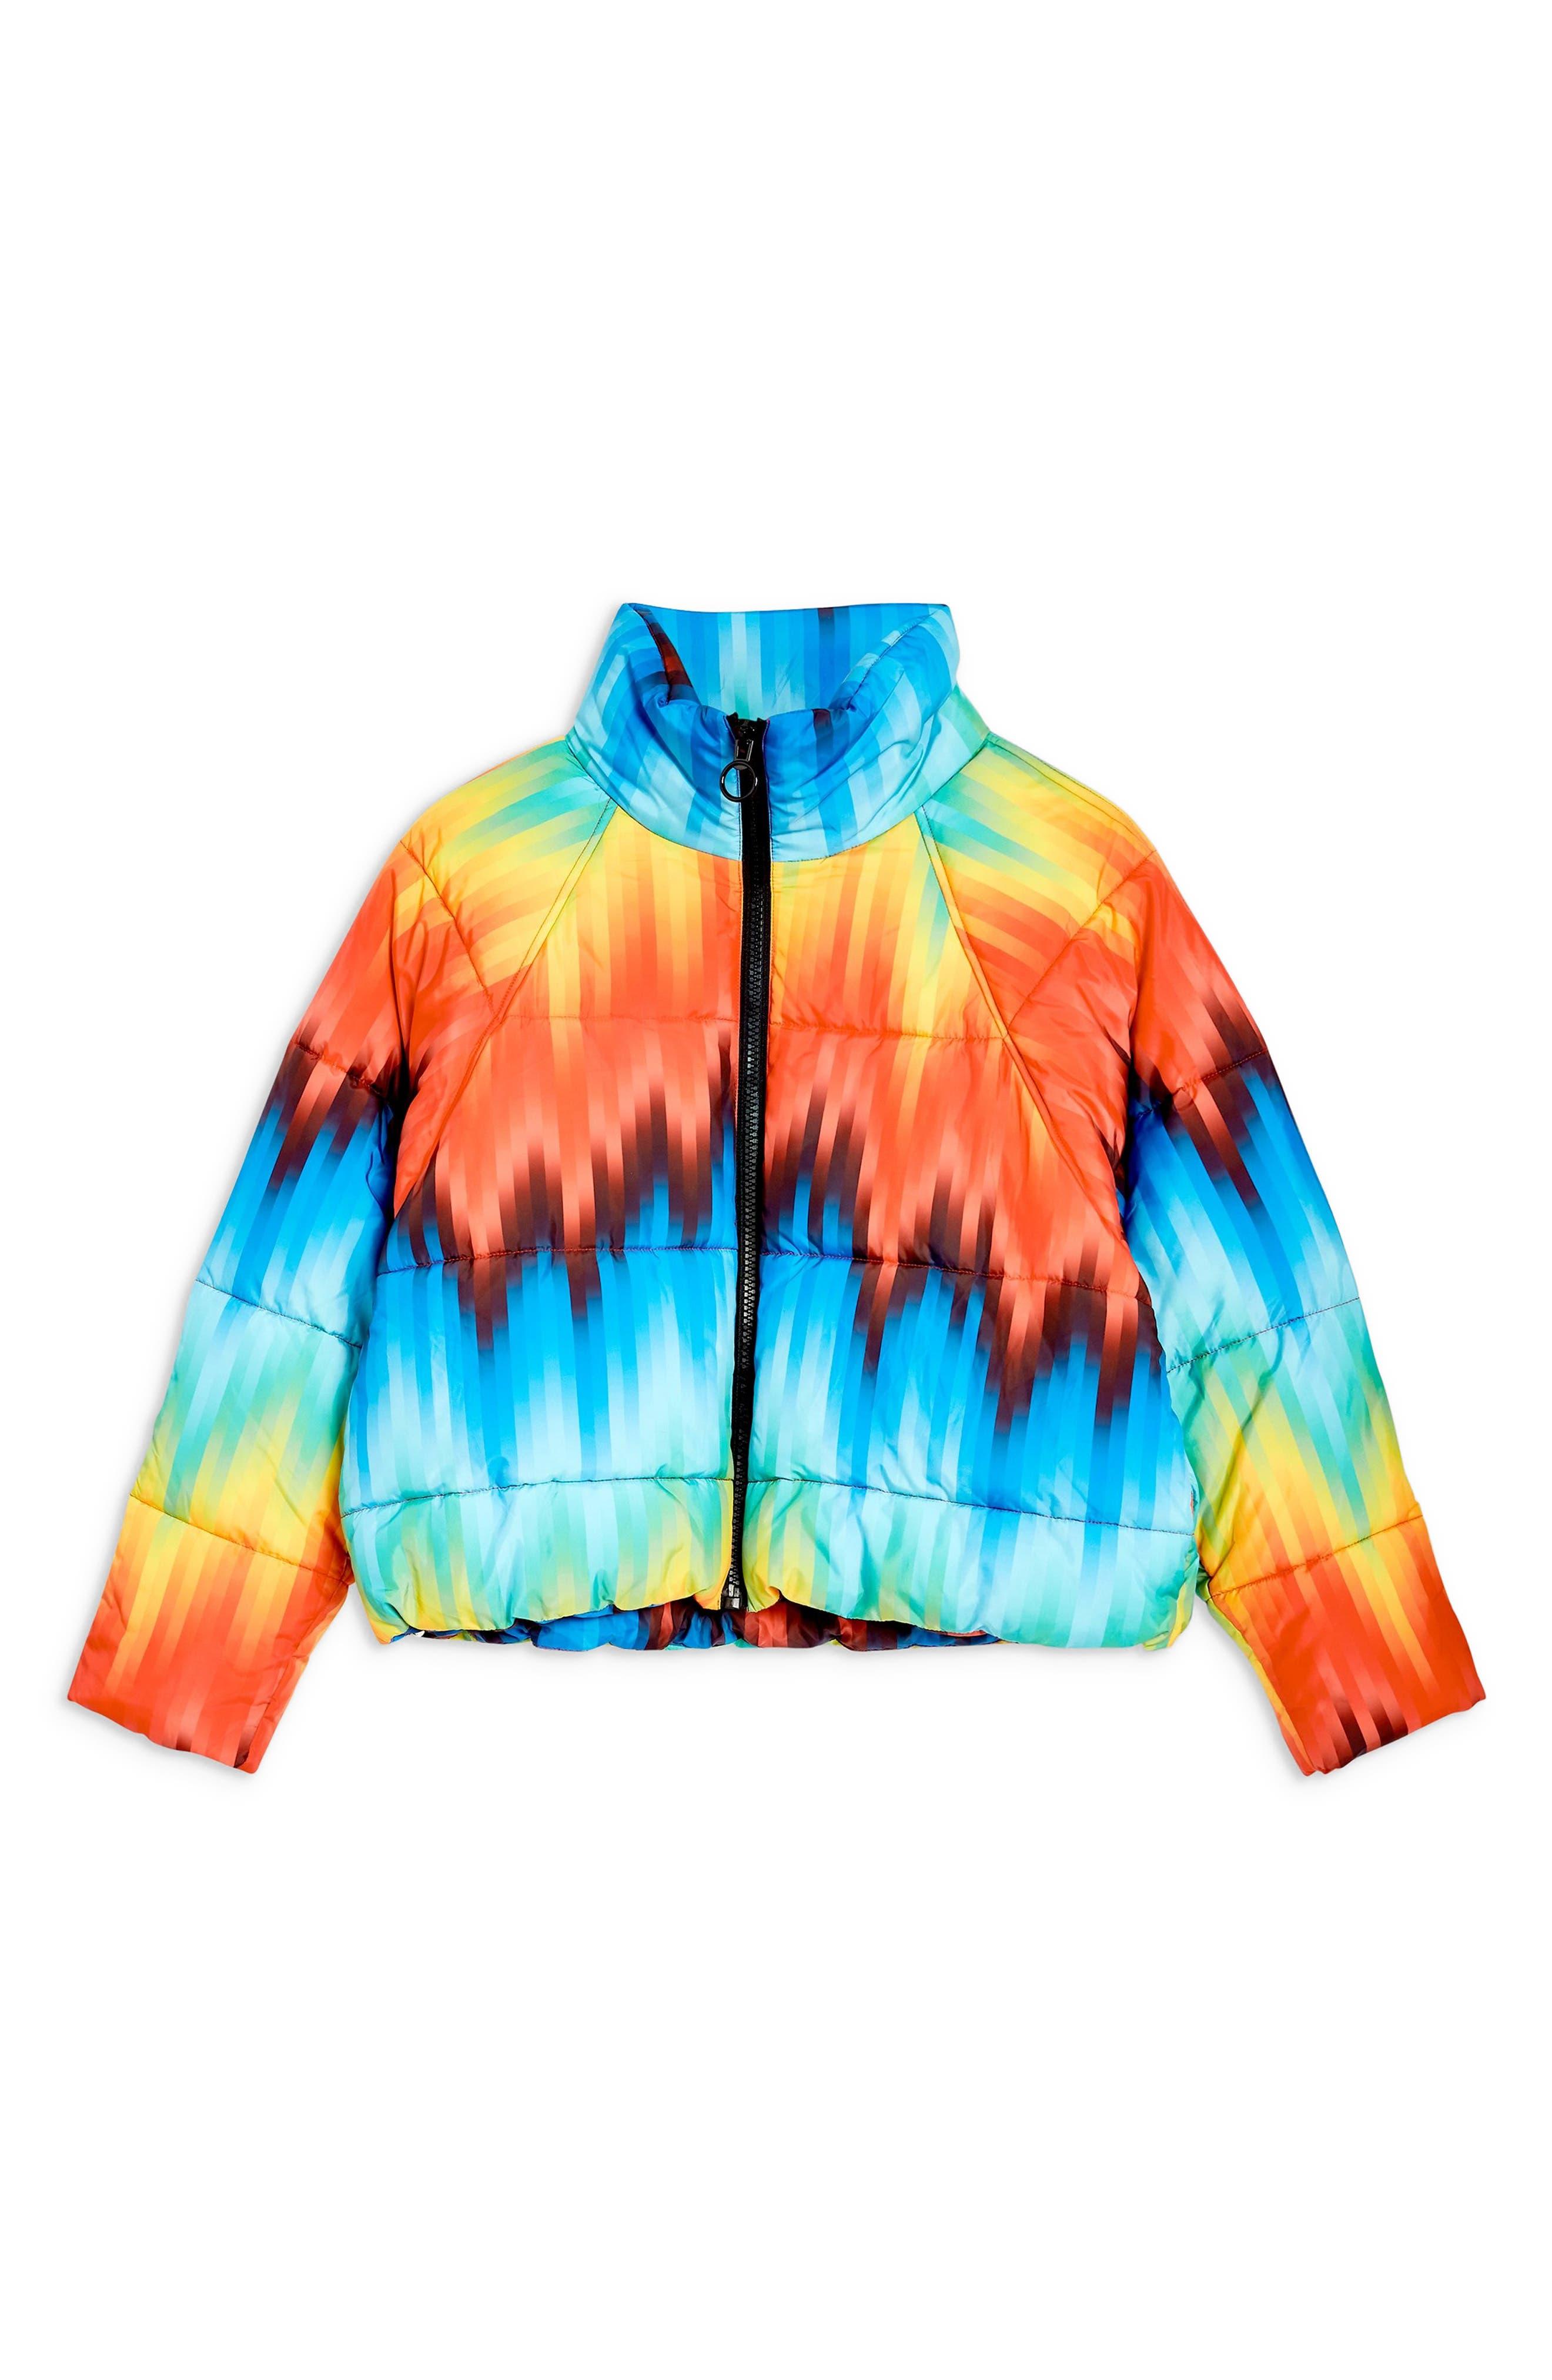 Rainbow Puffer Jacket,                             Alternate thumbnail 3, color,                             BLUE MULTI